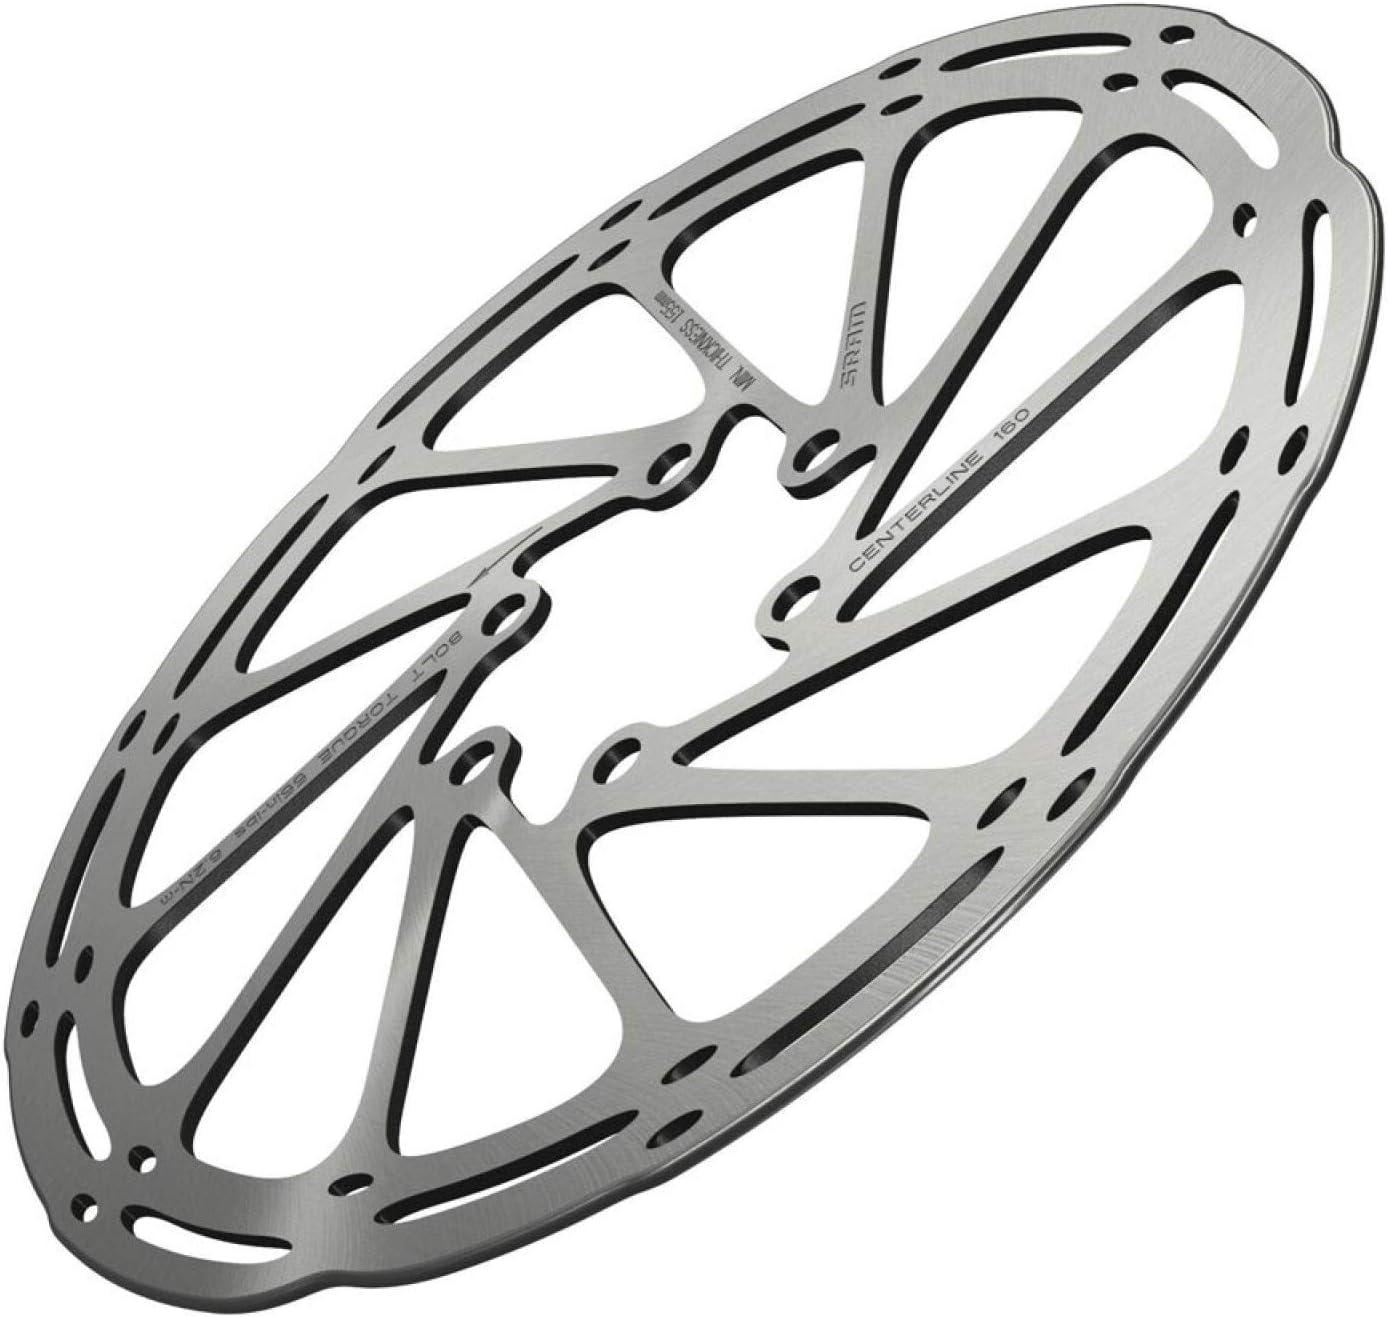 SRAM Centerline Rounded Rotor